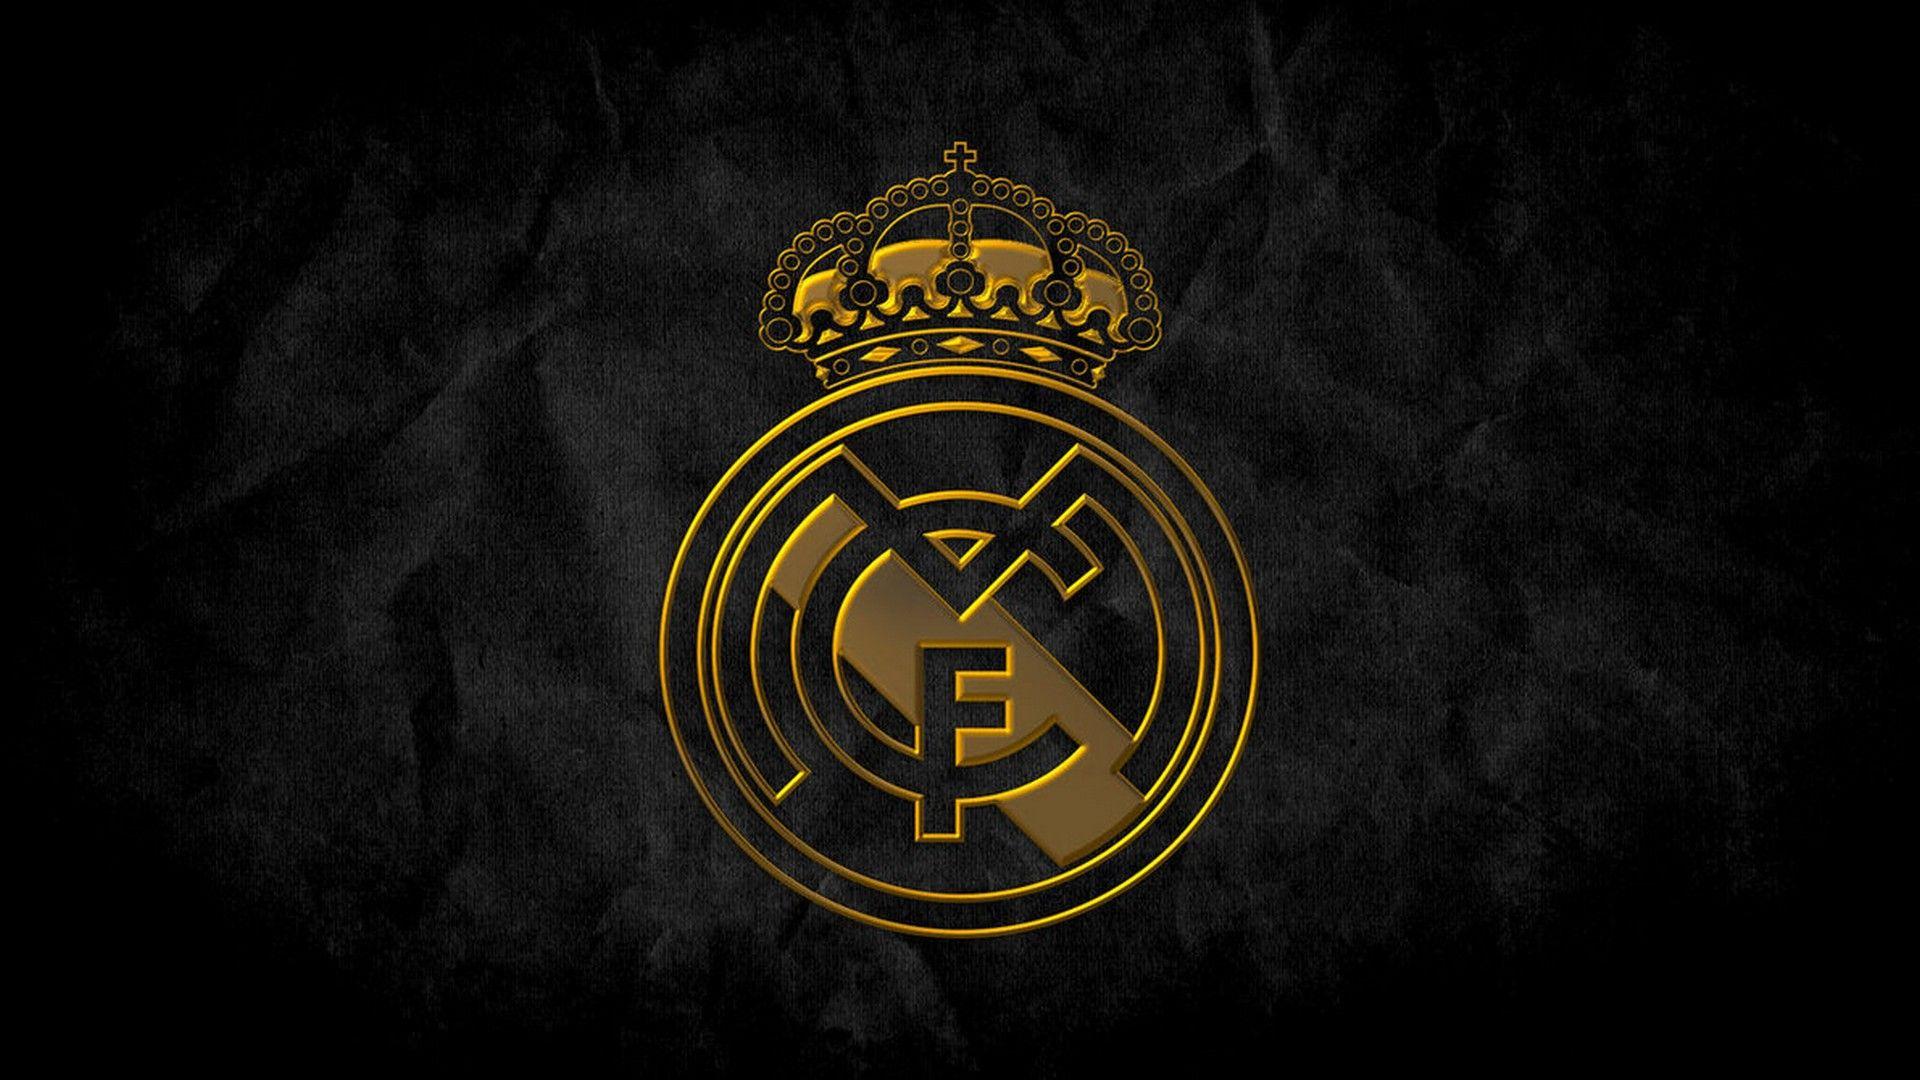 Real Madrid Cf Hd Wallpapers Best Wallpaper Hd Real Madrid Wallpapers Real Madrid Logo Wallpapers Madrid Wallpaper